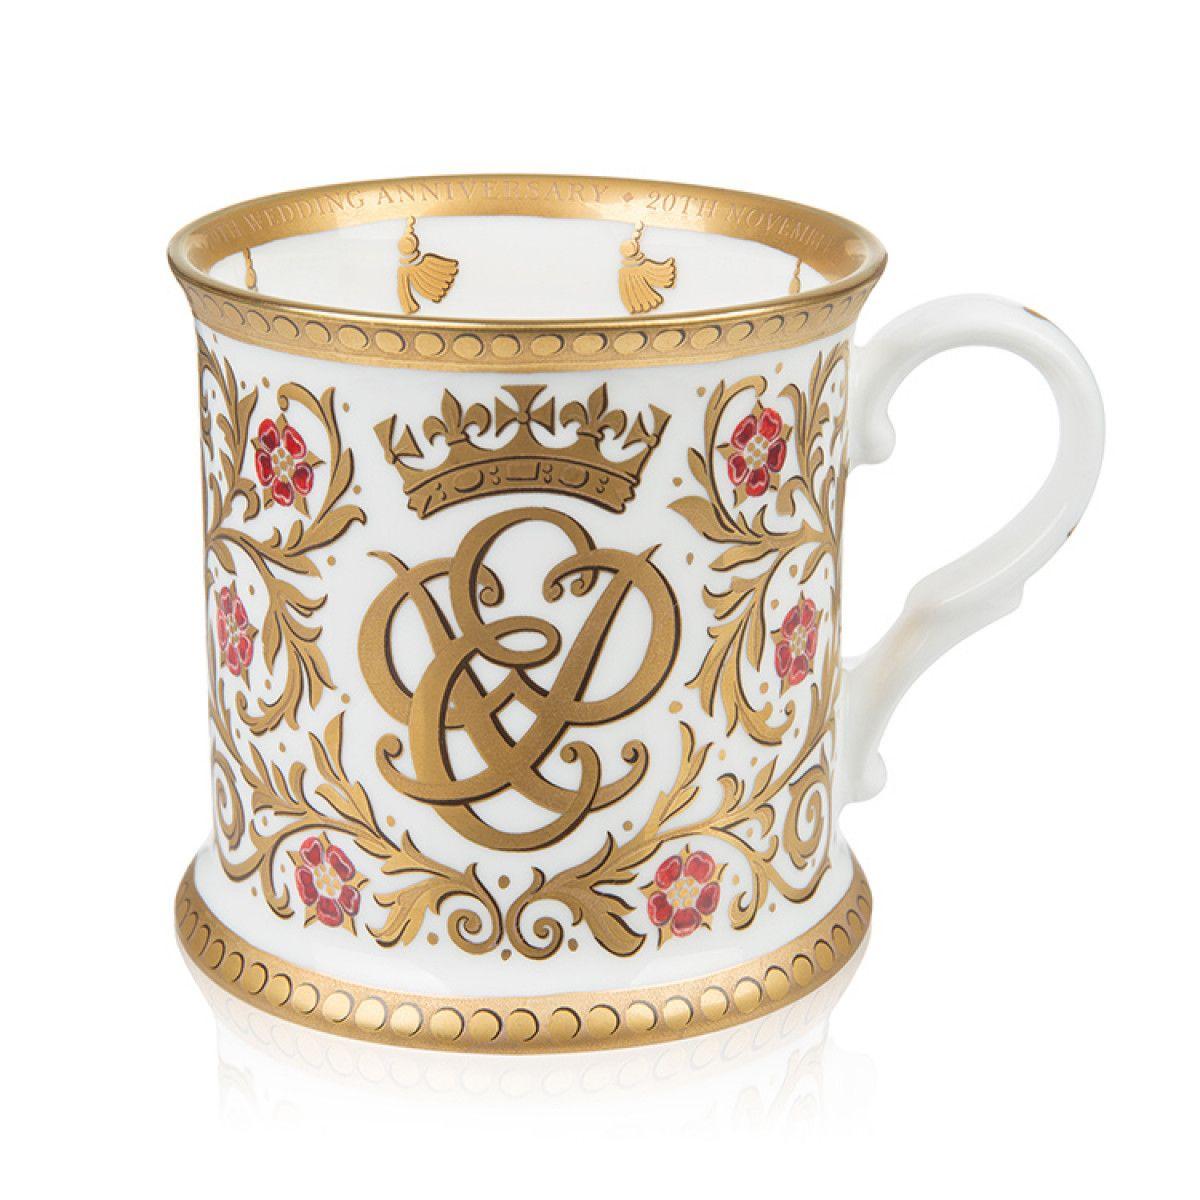 Buckingham Palace 70th Wedding Anniversary Commemorative